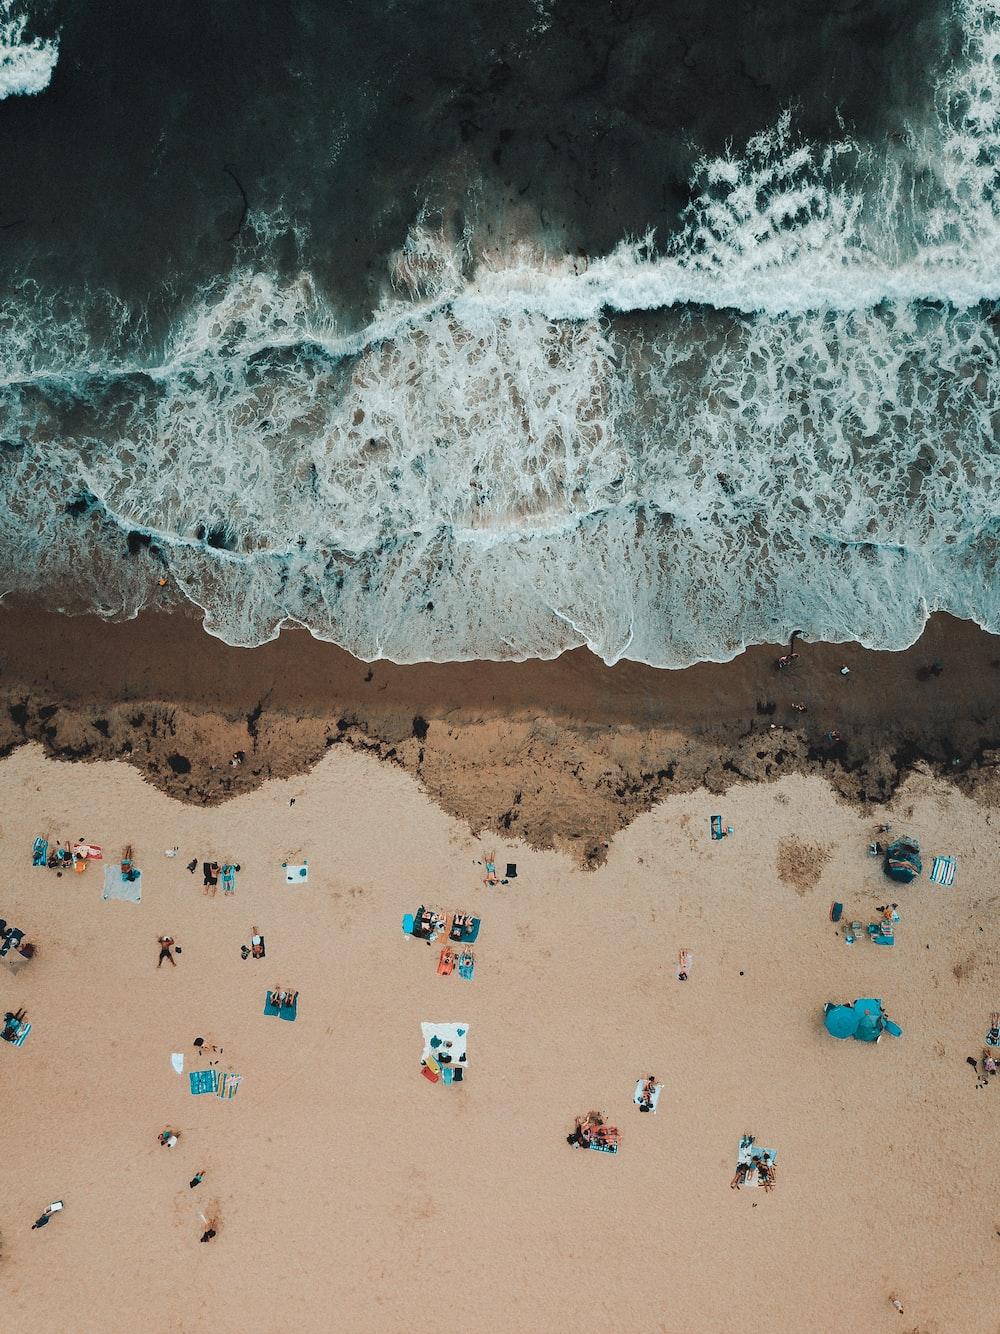 bird's eye view photography of people near seashore